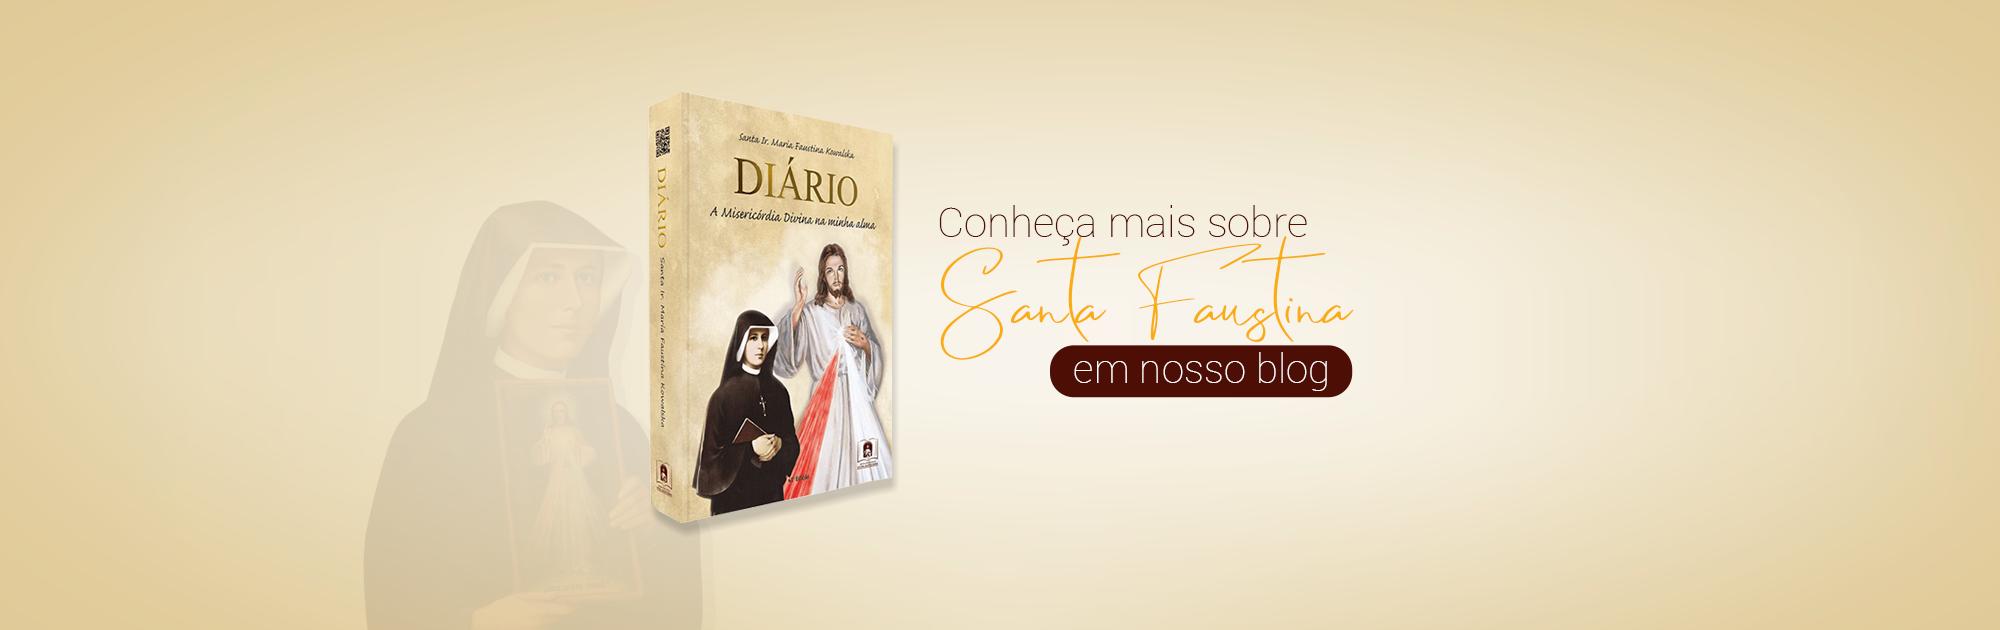 Banner-2-Blog-(2000x630---Frases-inspiradoras-de-Santa-Faustina)---Santuário-da-Divina-Misericórdia